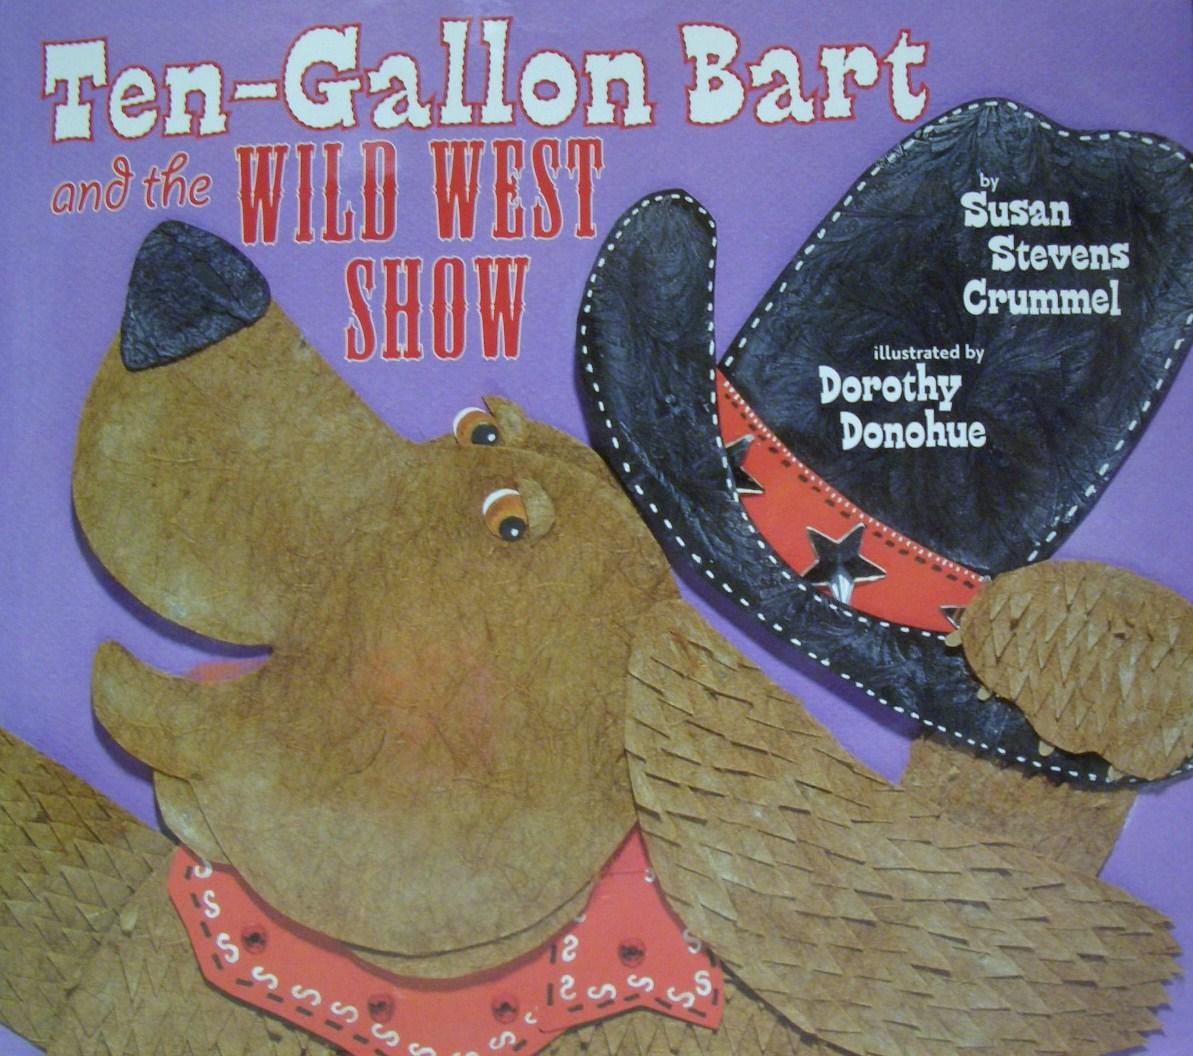 Ten Gallon Bart WW Show cover.JPG